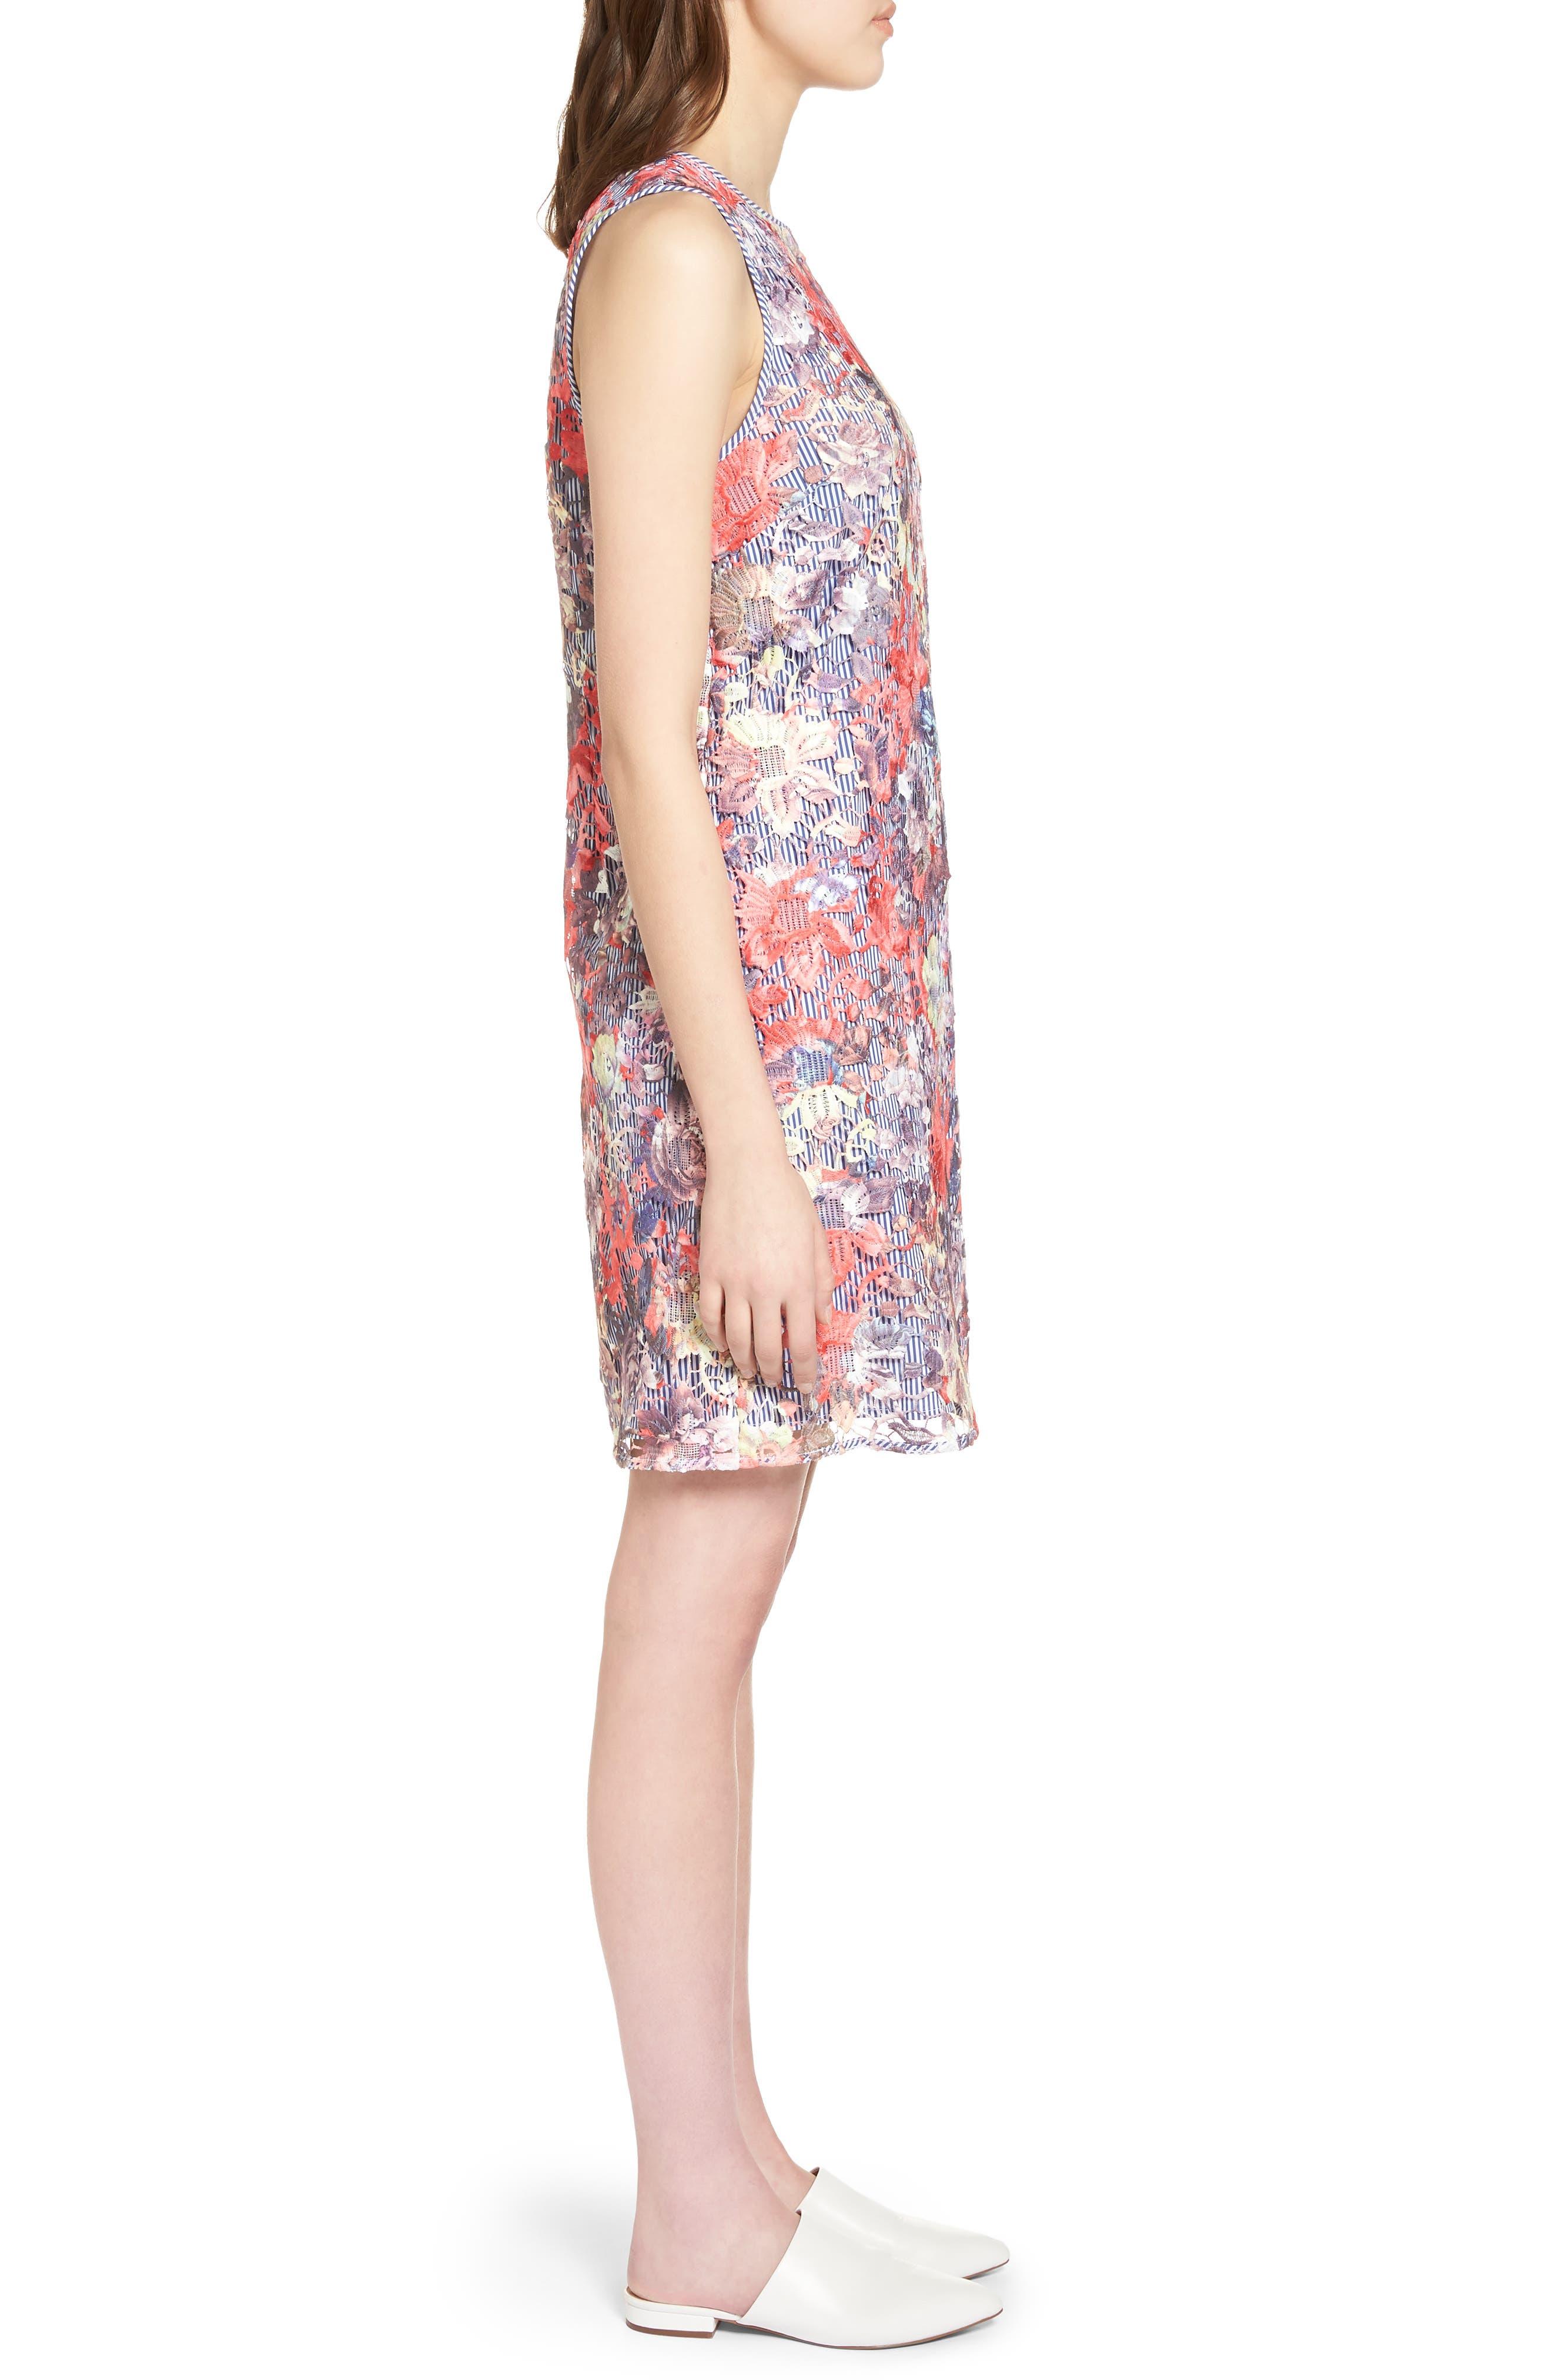 Lace Pinstripe Tank Dress,                             Alternate thumbnail 3, color,                             Coral Lace Pattern